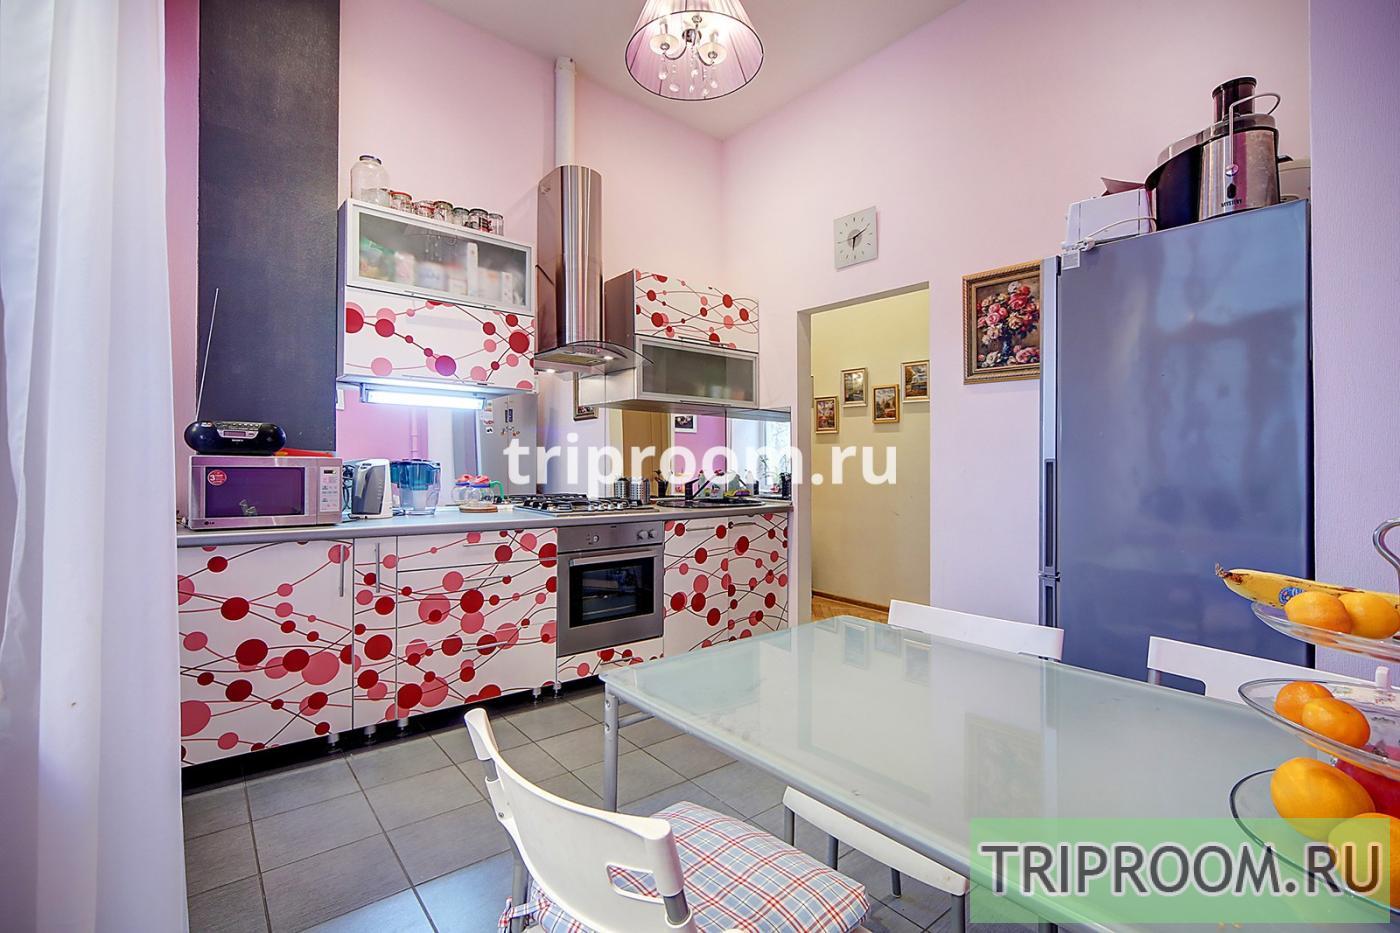 2-комнатная квартира посуточно (вариант № 15426), ул. Лиговский проспект, фото № 21